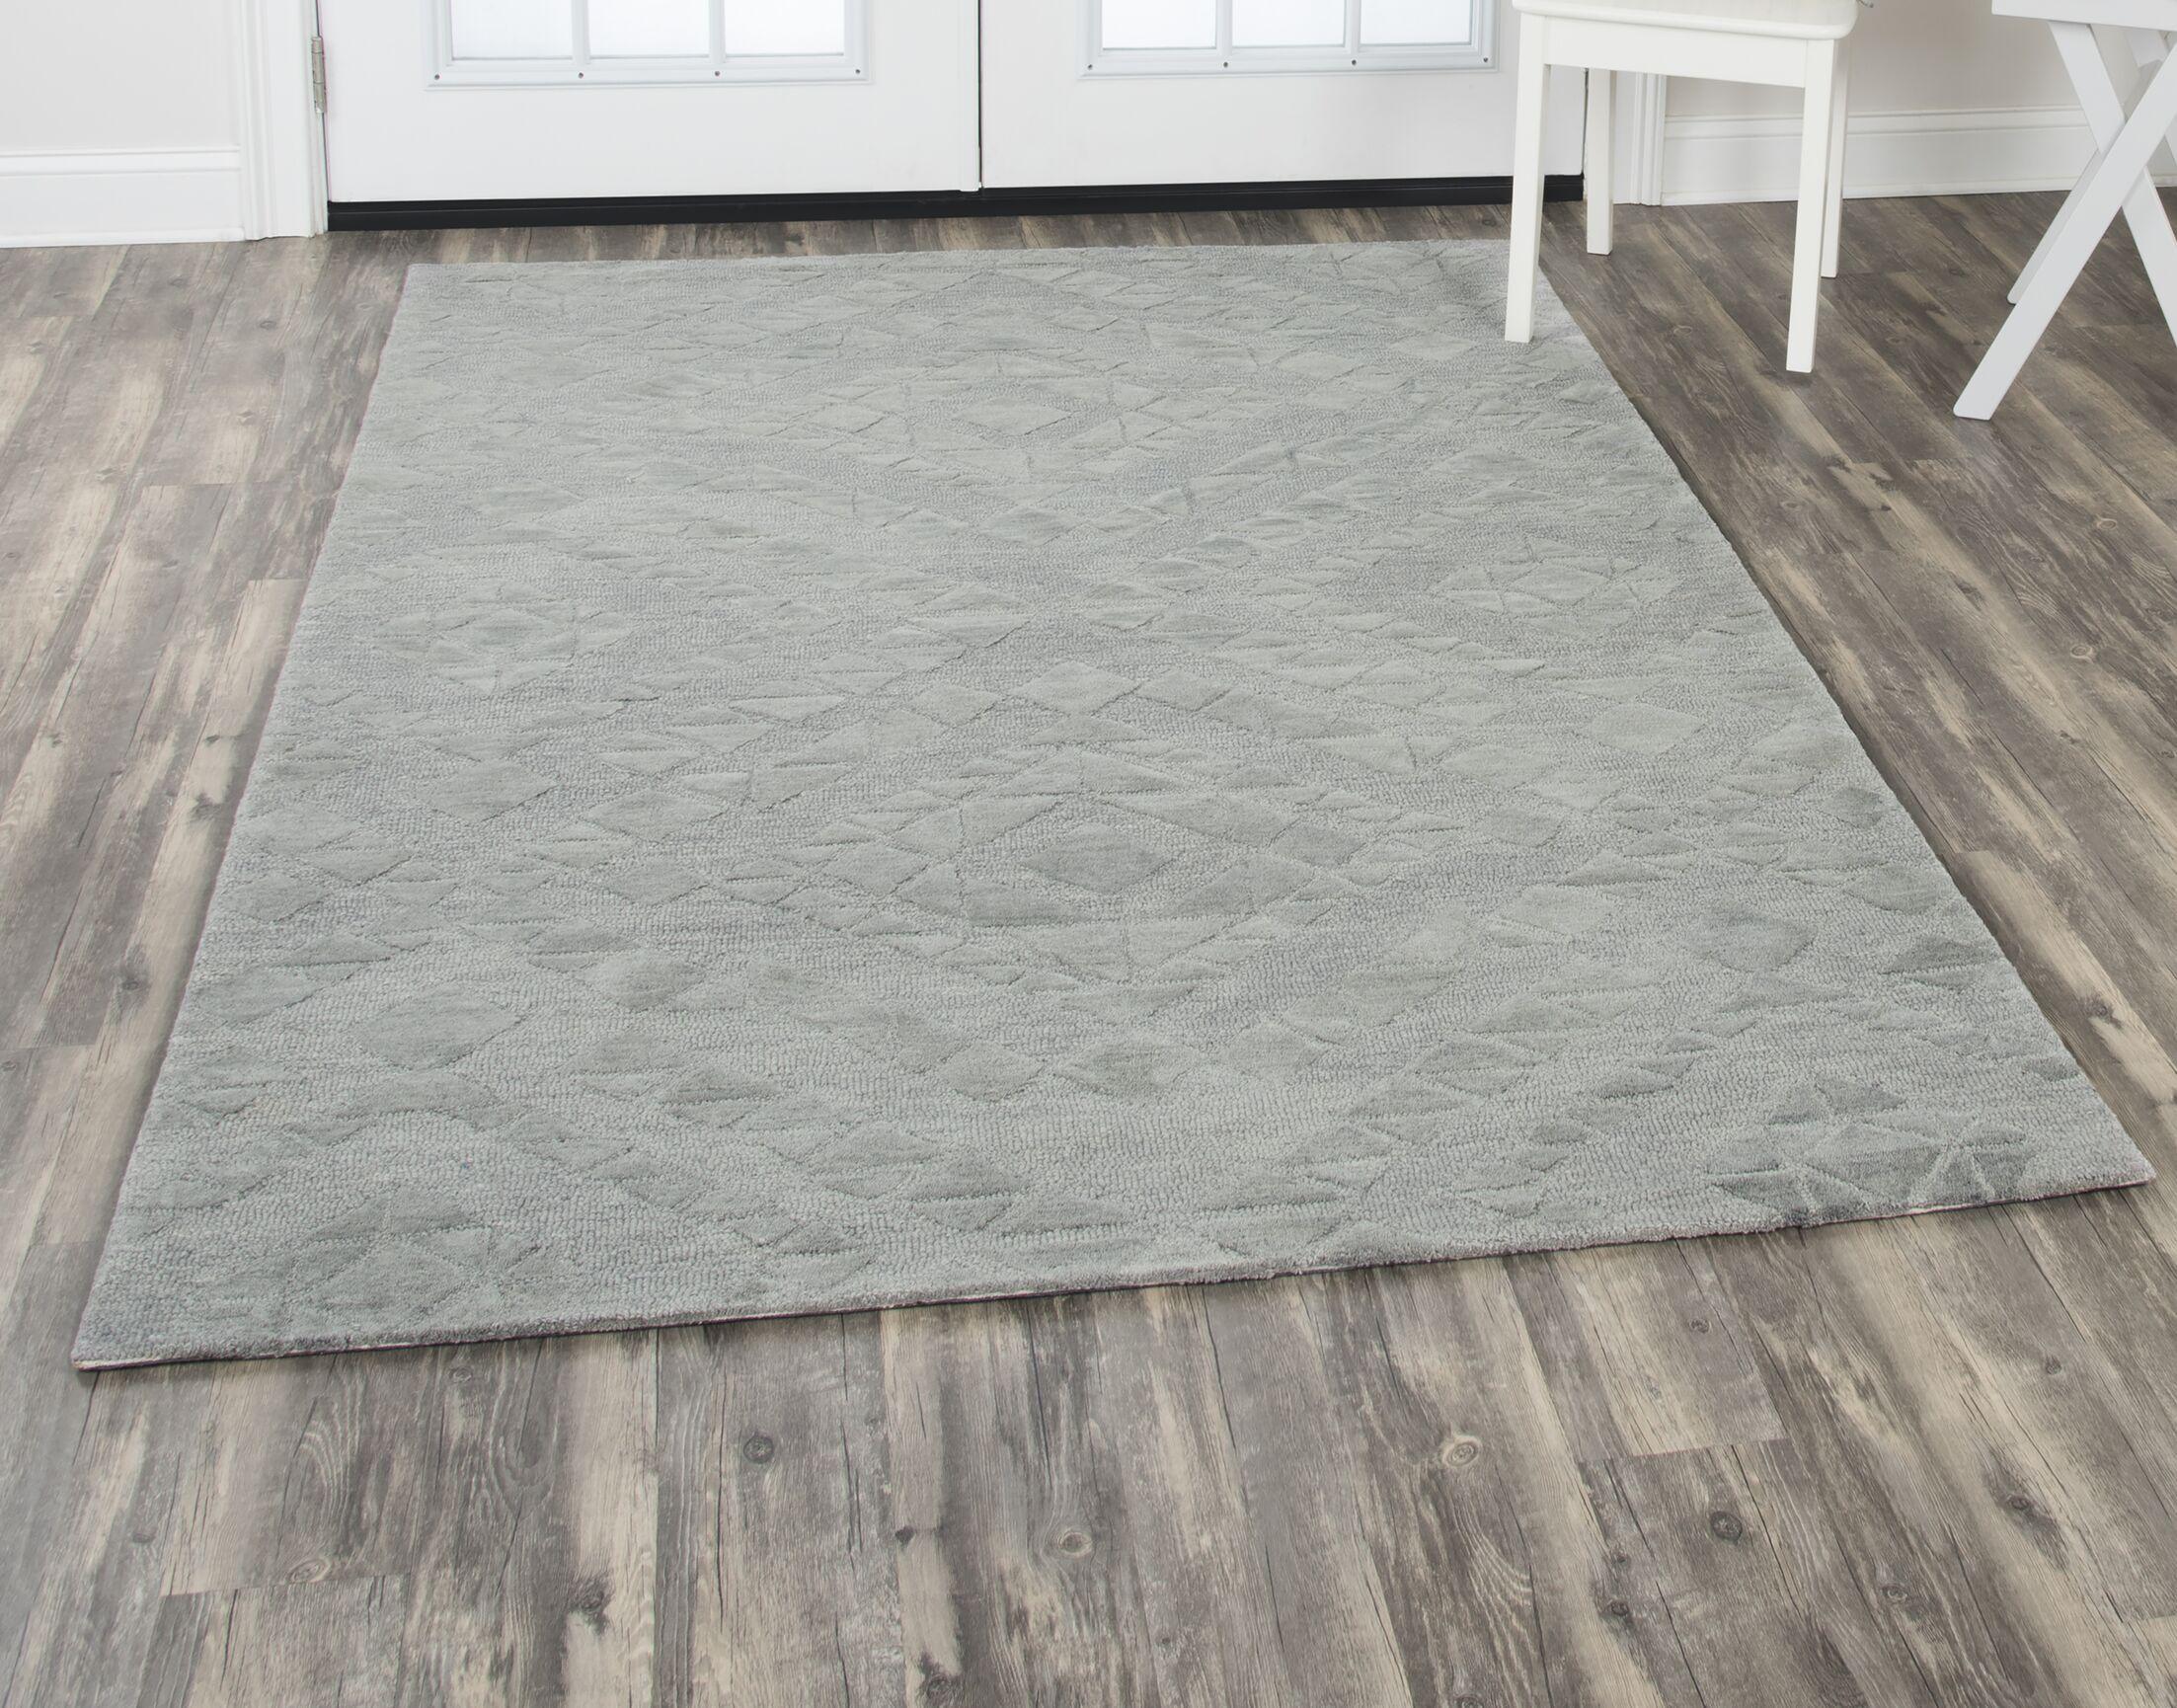 Phan Hand-Tufted Wool Gray Area Rug Rug Size: Rectangle9' x 12'